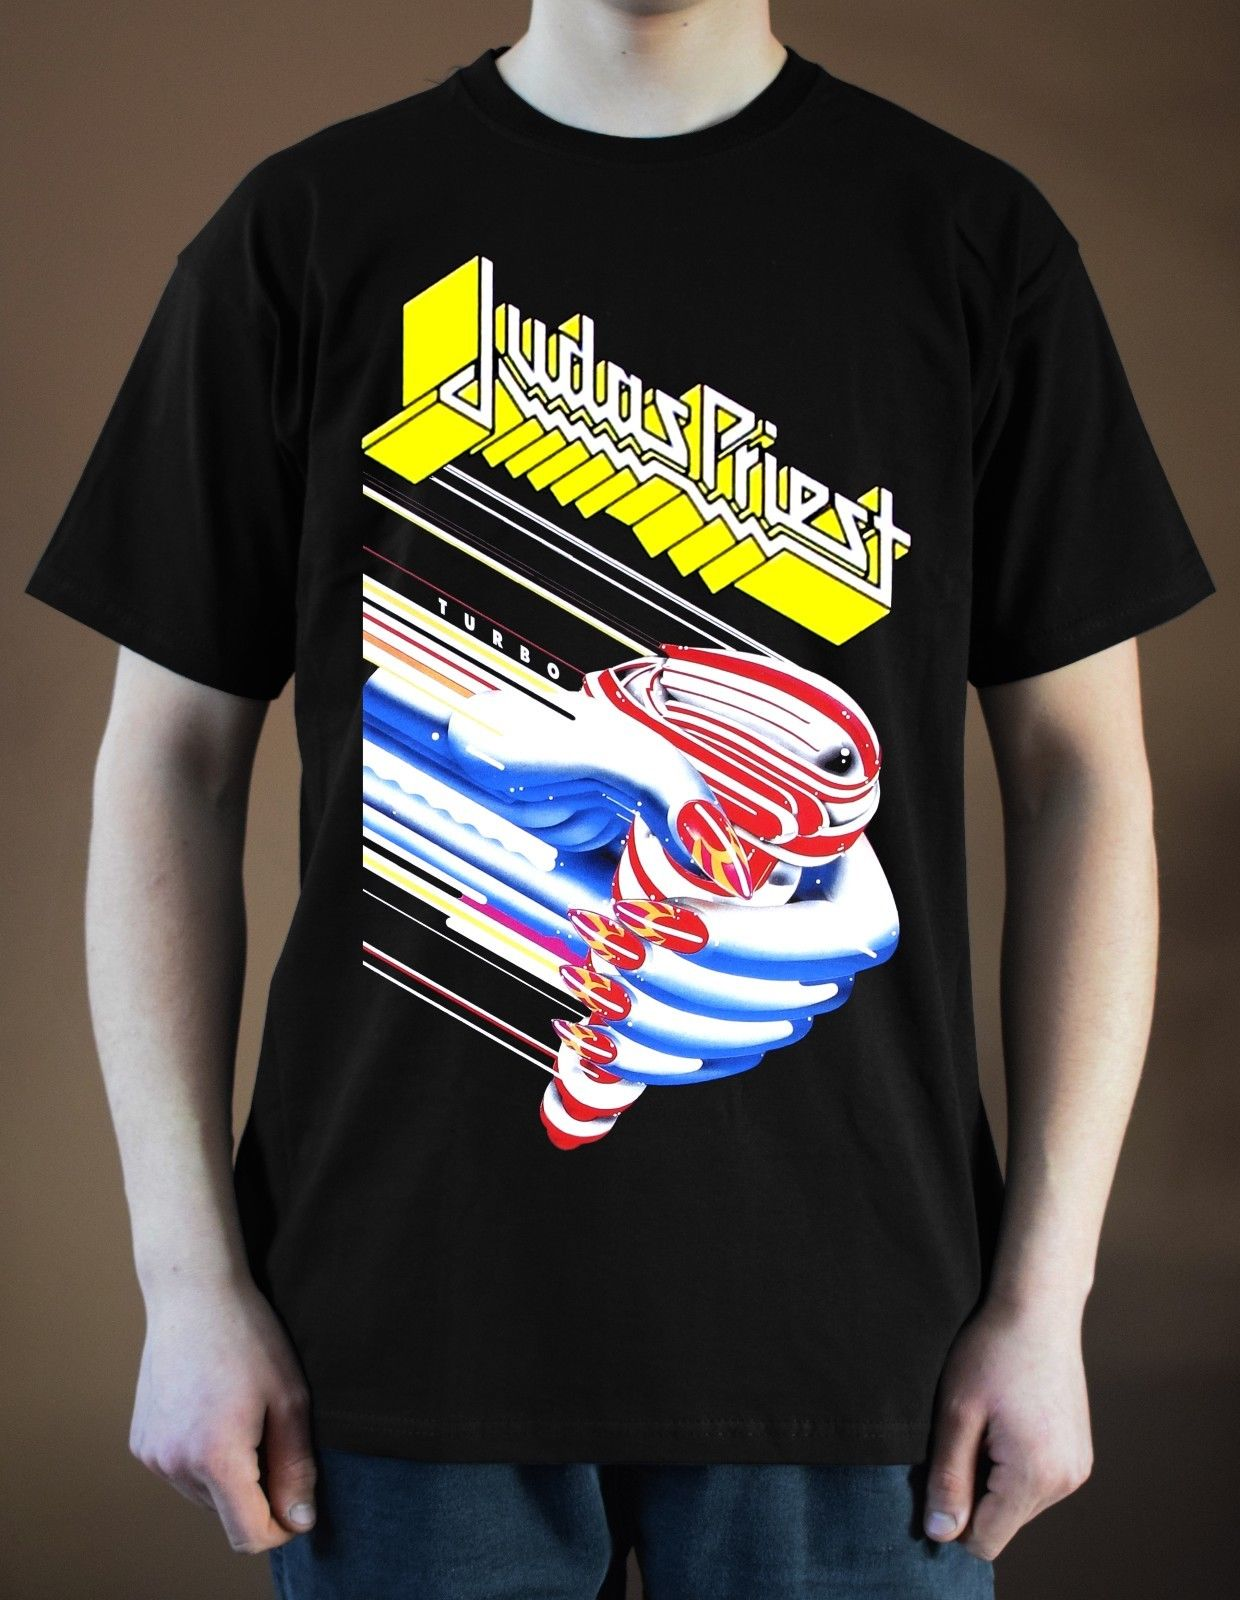 ¡JUDAS sacerdote Turbo Ver! 1 camiseta Heavy Metal Hard Rock Ian Hill (negro) mangas S-3XL Camiseta de algodón camiseta Top de moda